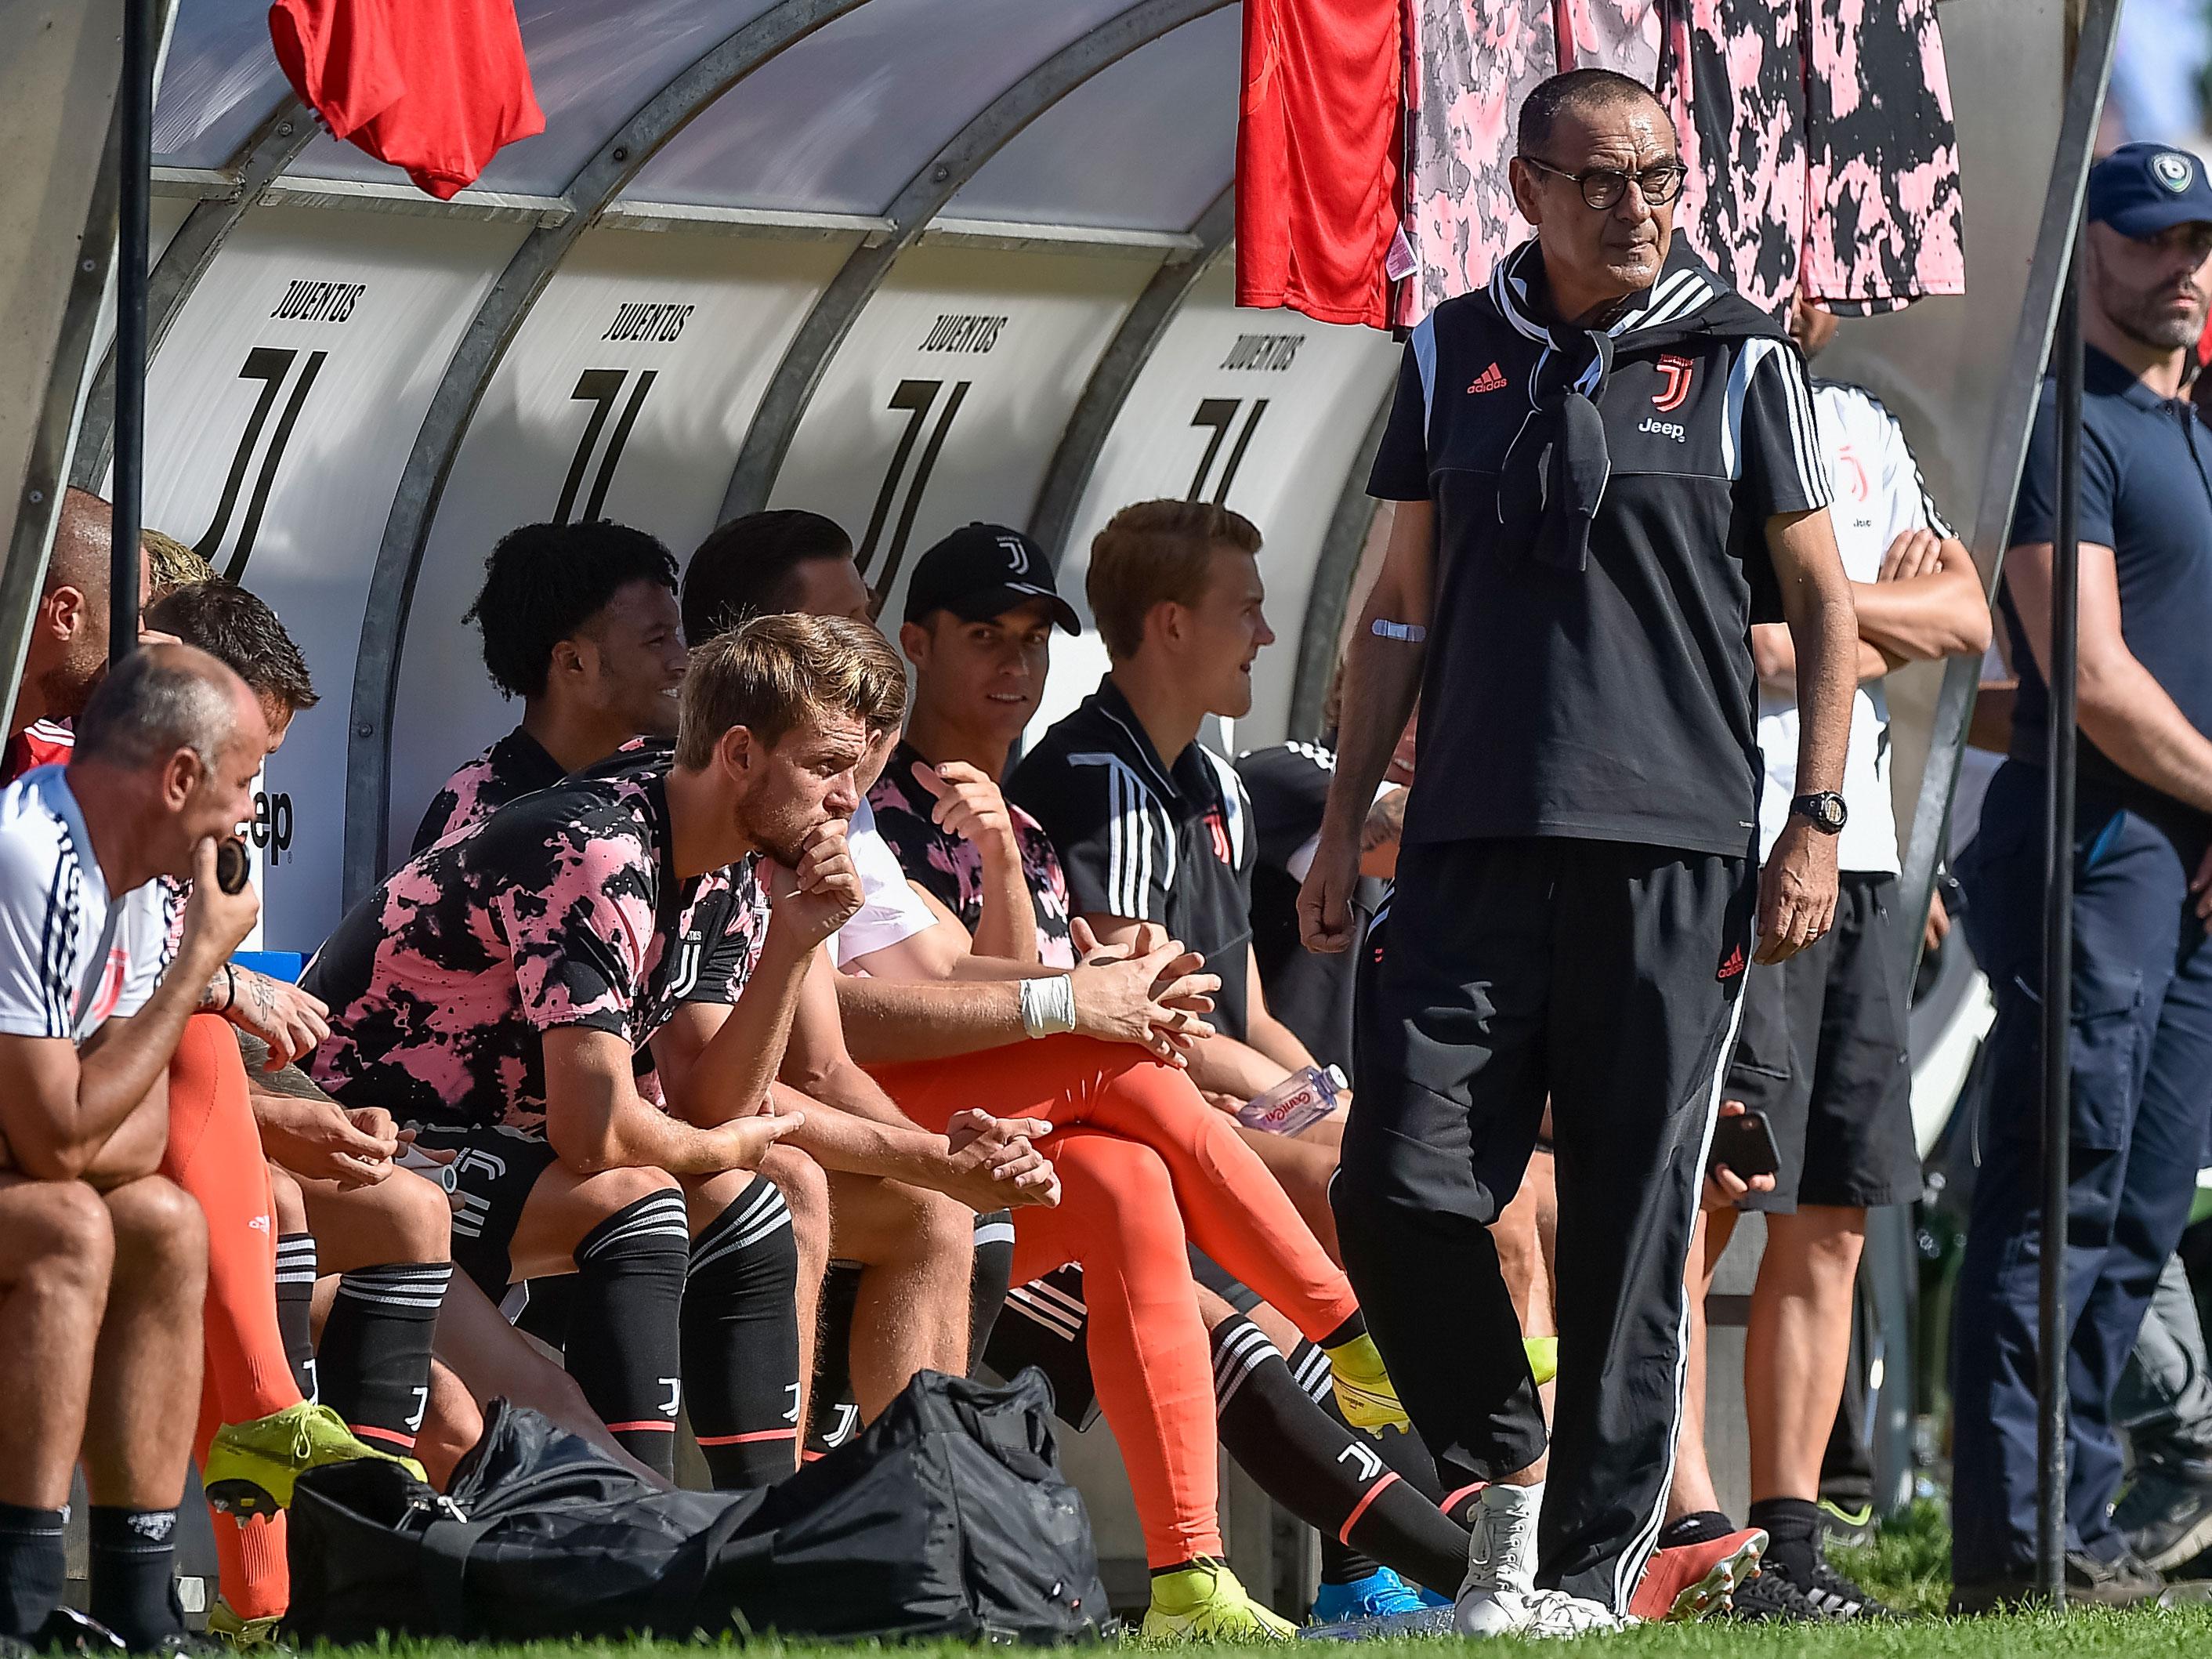 Maurizio Sarri is in his first season coaching Juventus